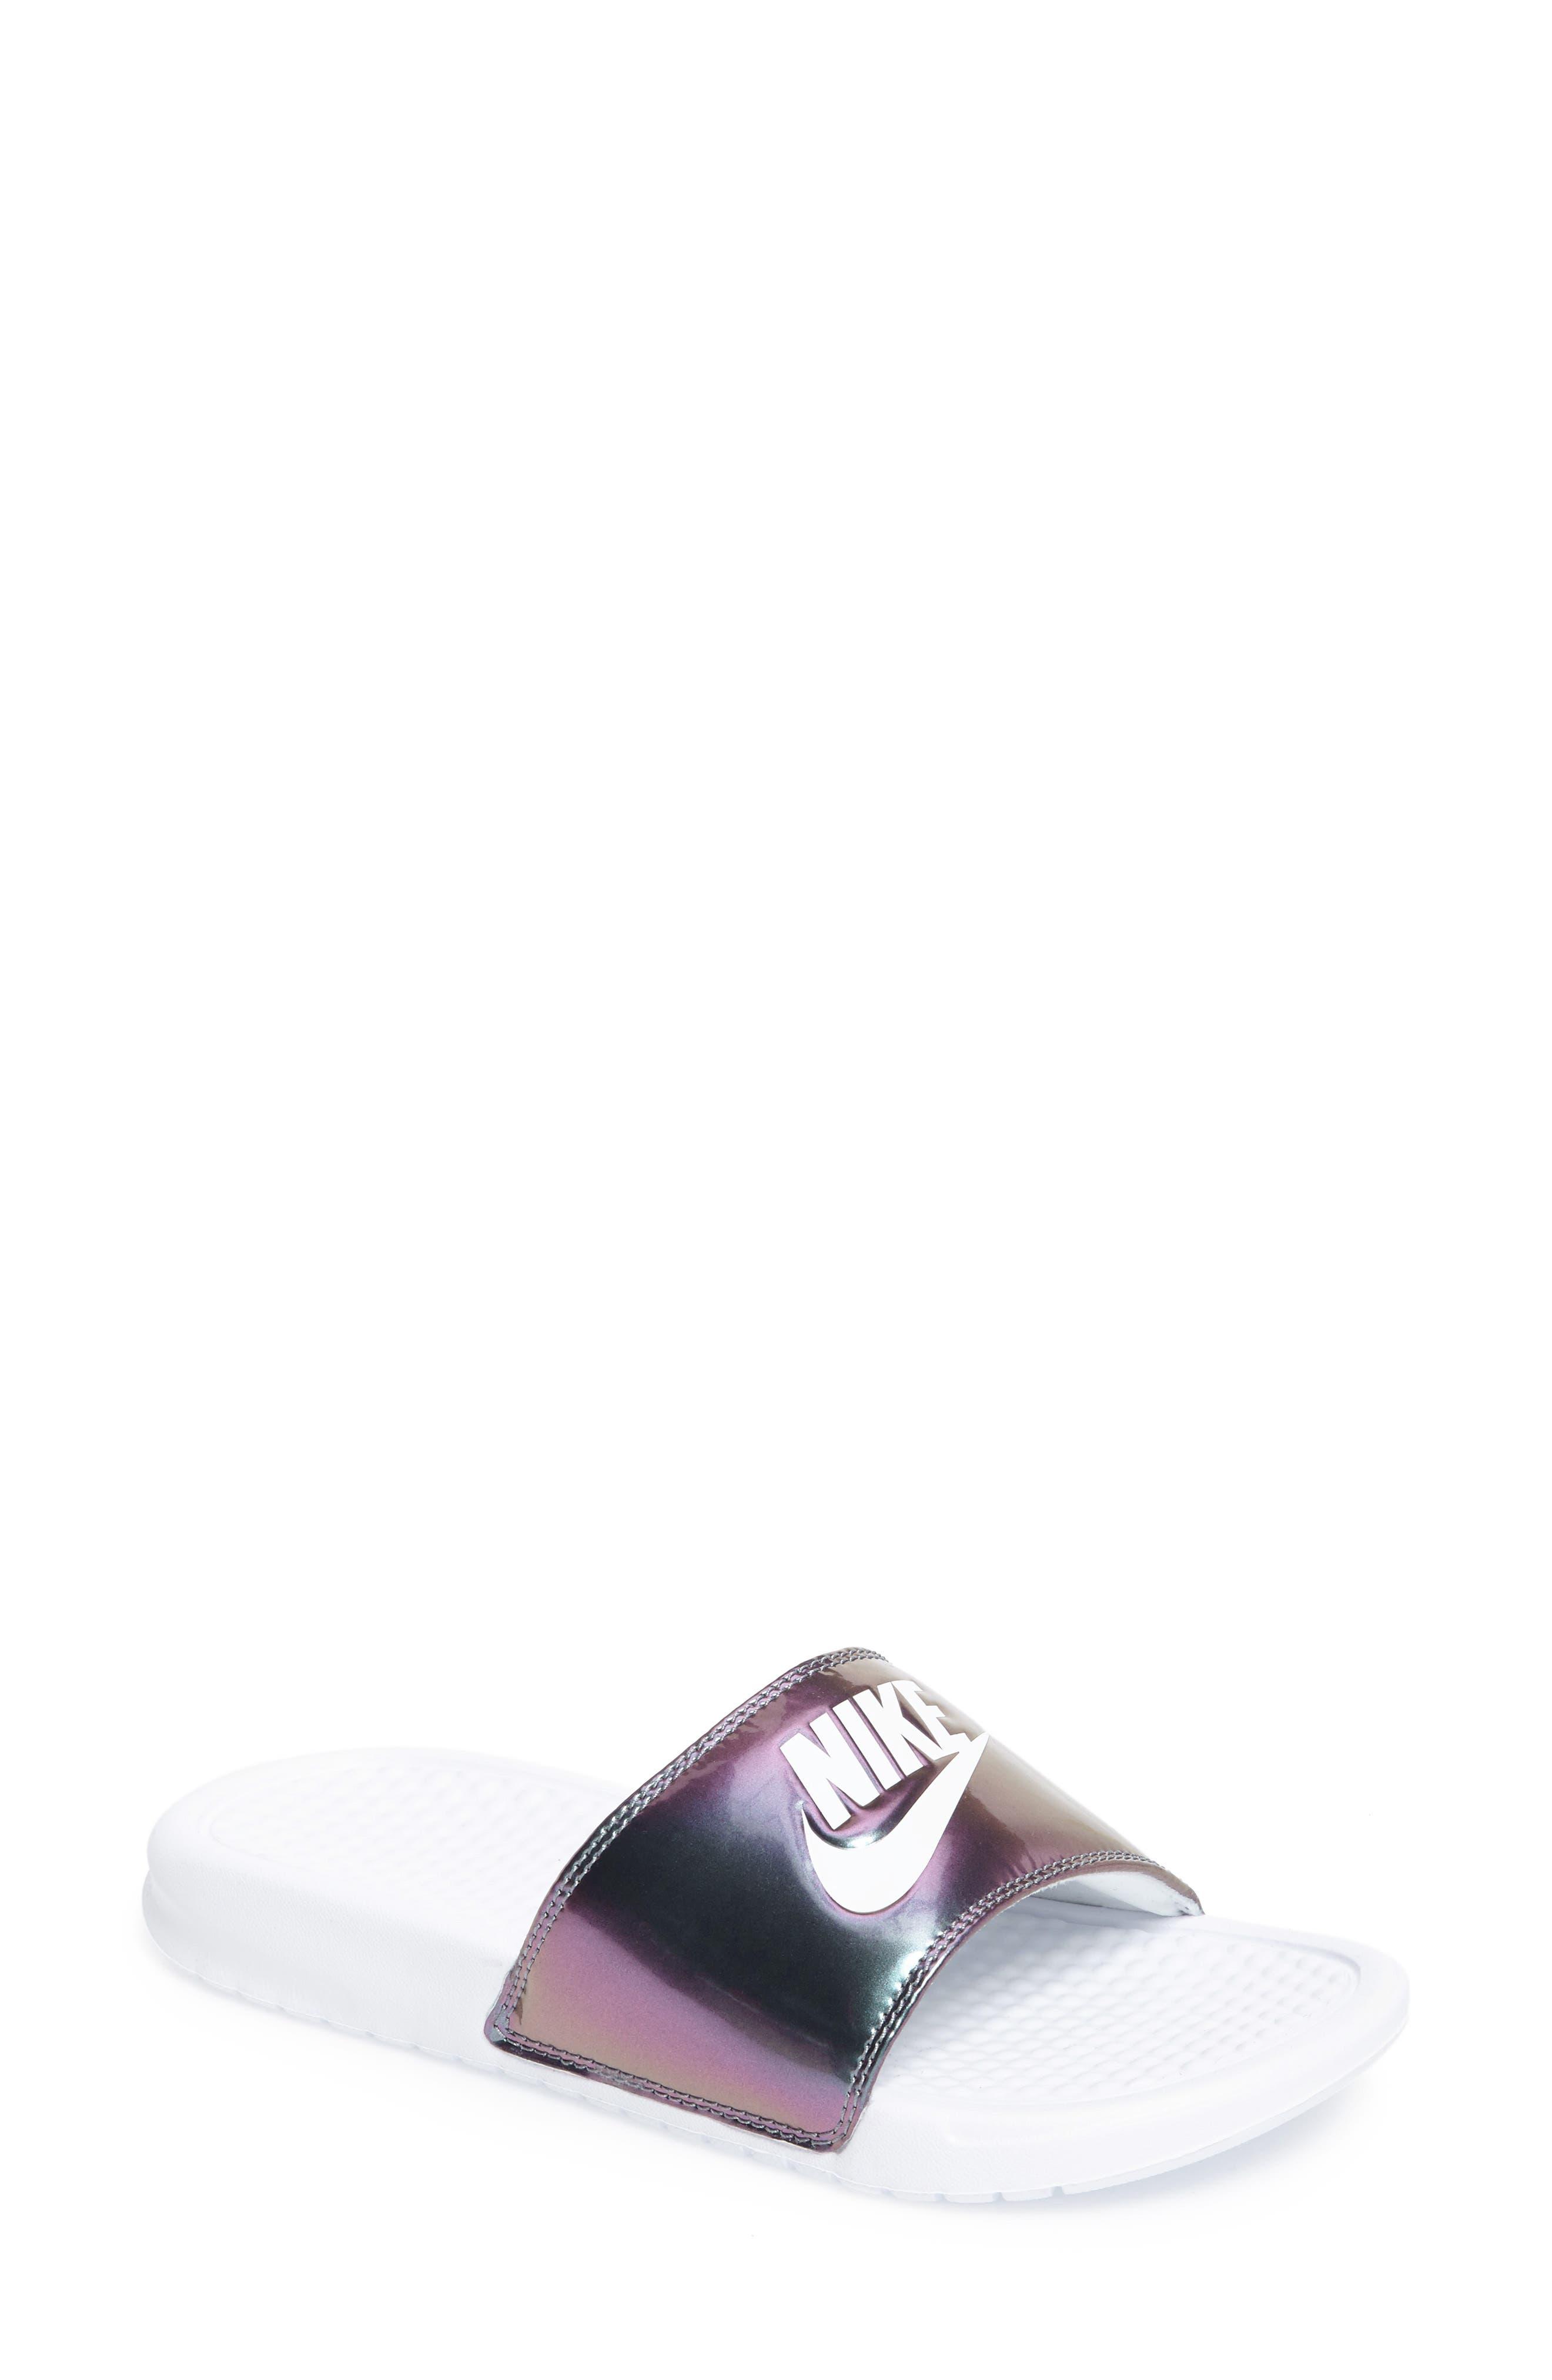 'Benassi - Just Do It' Print Sandal,                         Main,                         color, White/ White